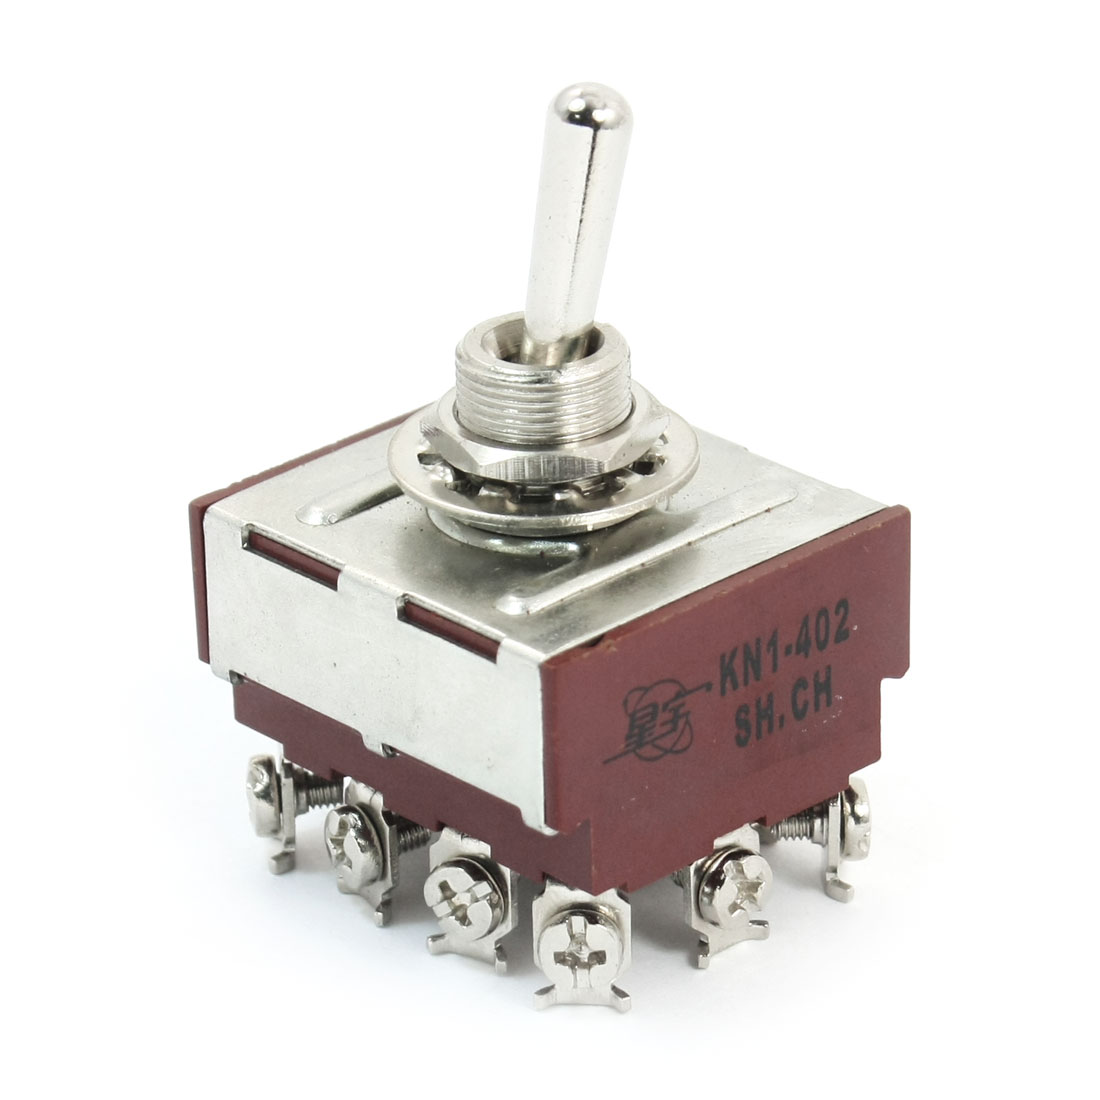 4PDT 2 Positions ON/ON Auto Motor Rocker Toggle Switch AC 250V 8A